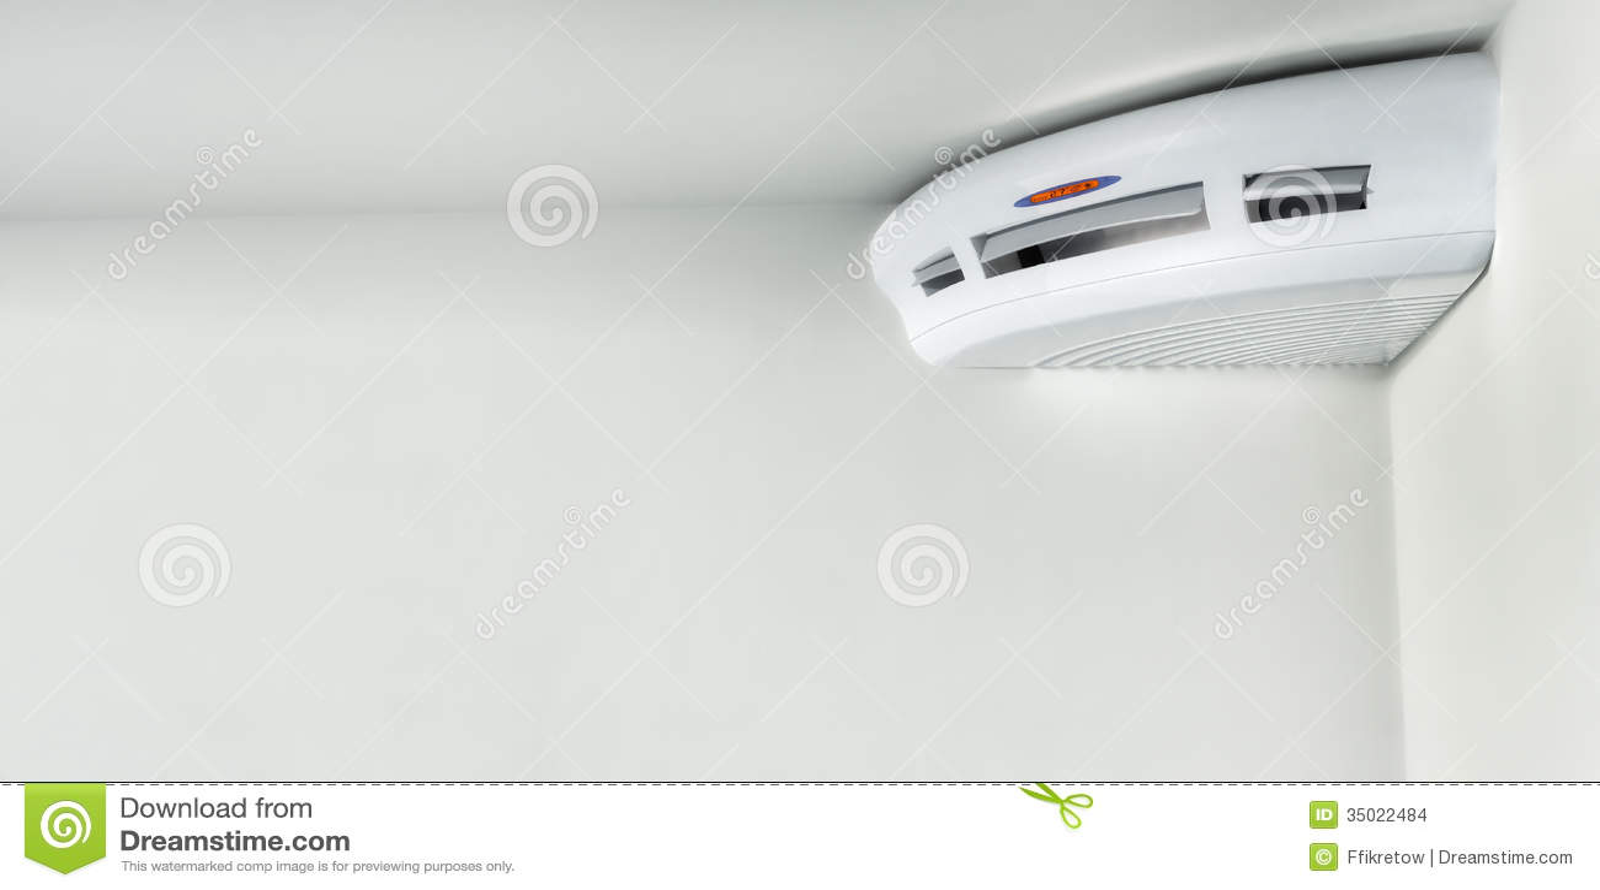 Bedroom Wall Air Conditioner